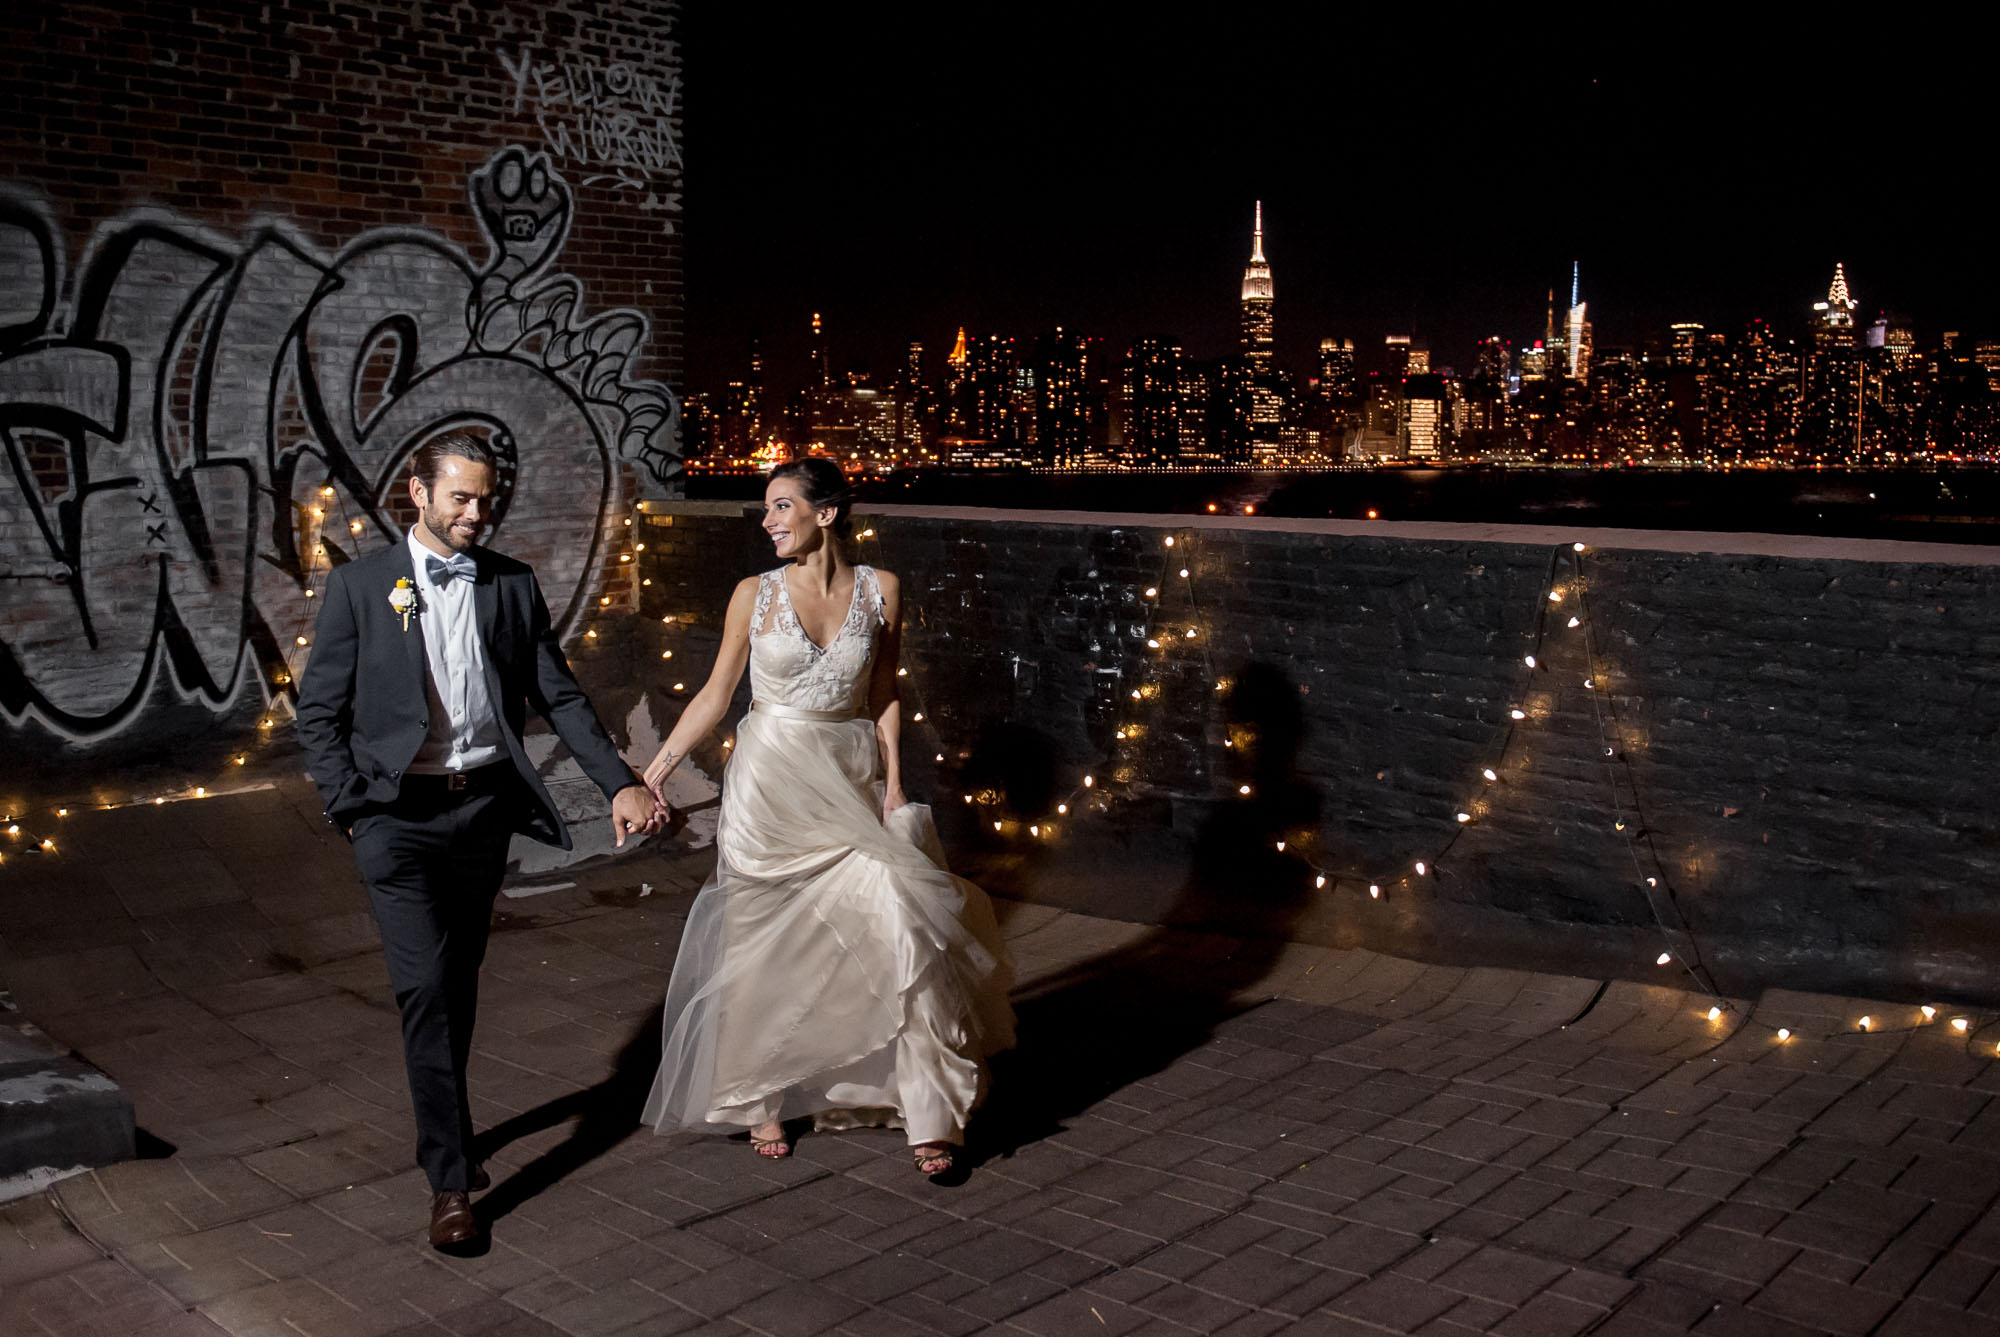 DSC_8847greenpoint-lofts-brooklyn-wedding-057.jpg